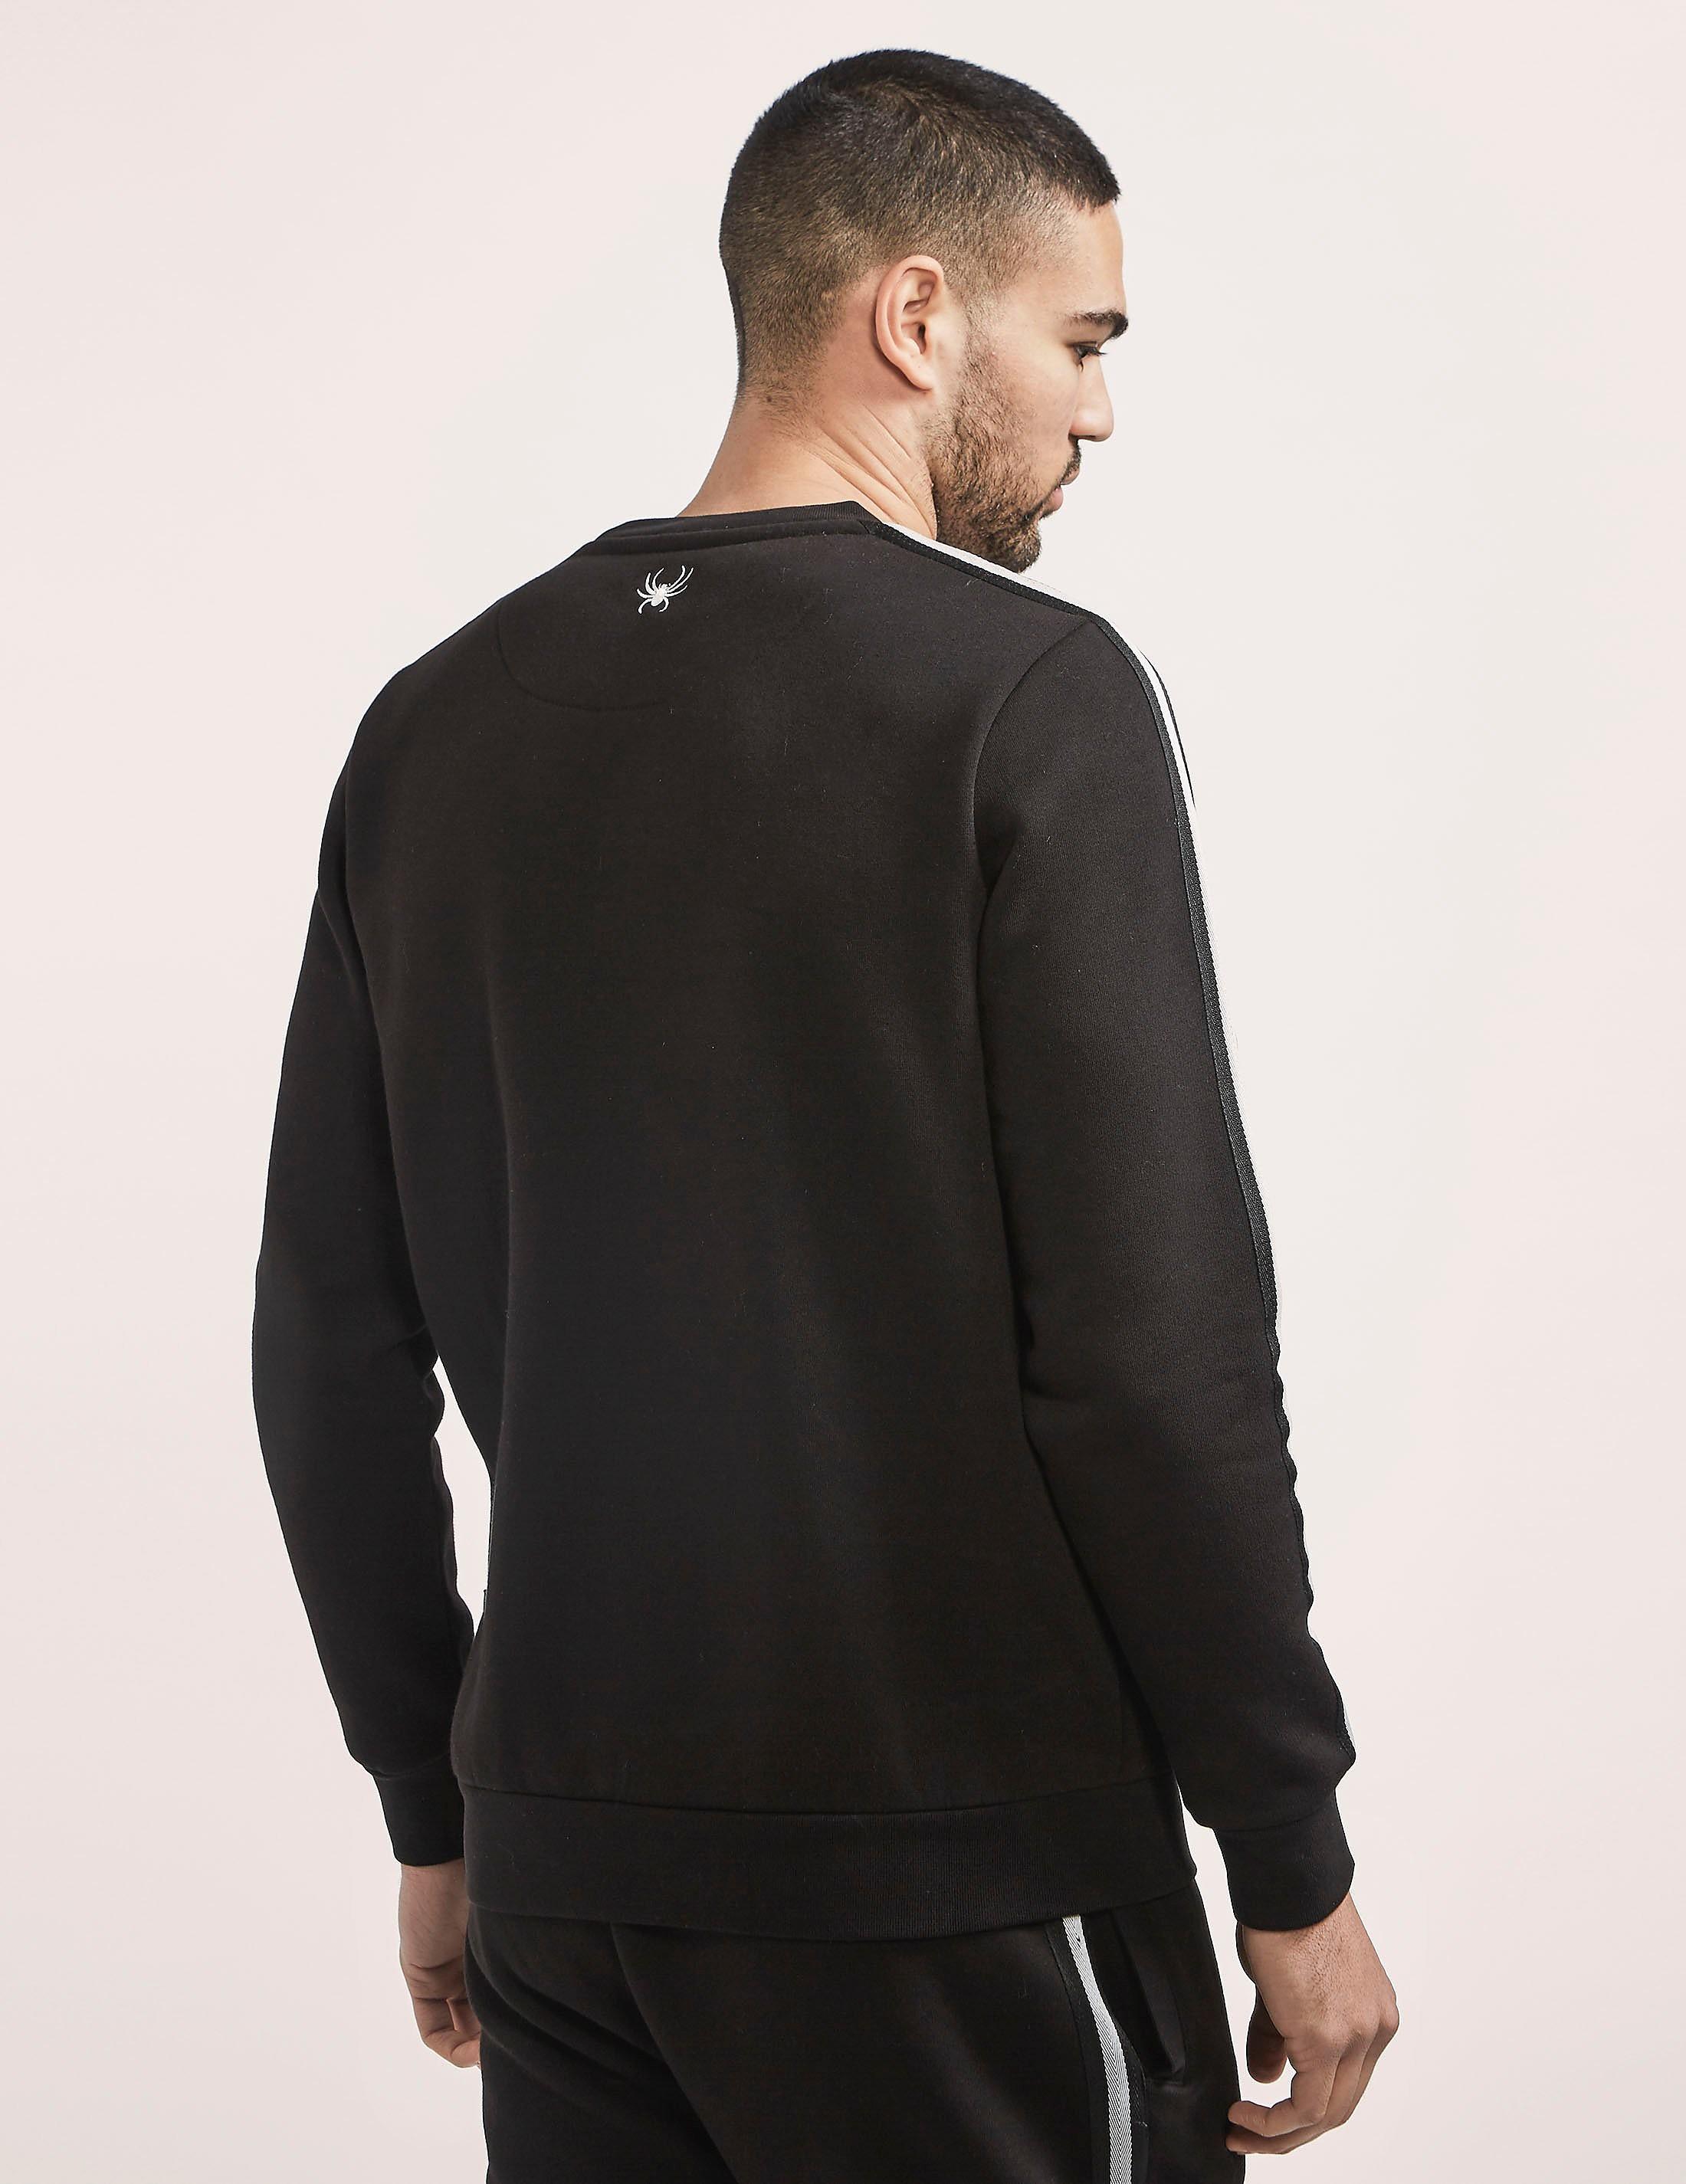 Intense Clothing Envy Crew Sweatshirt